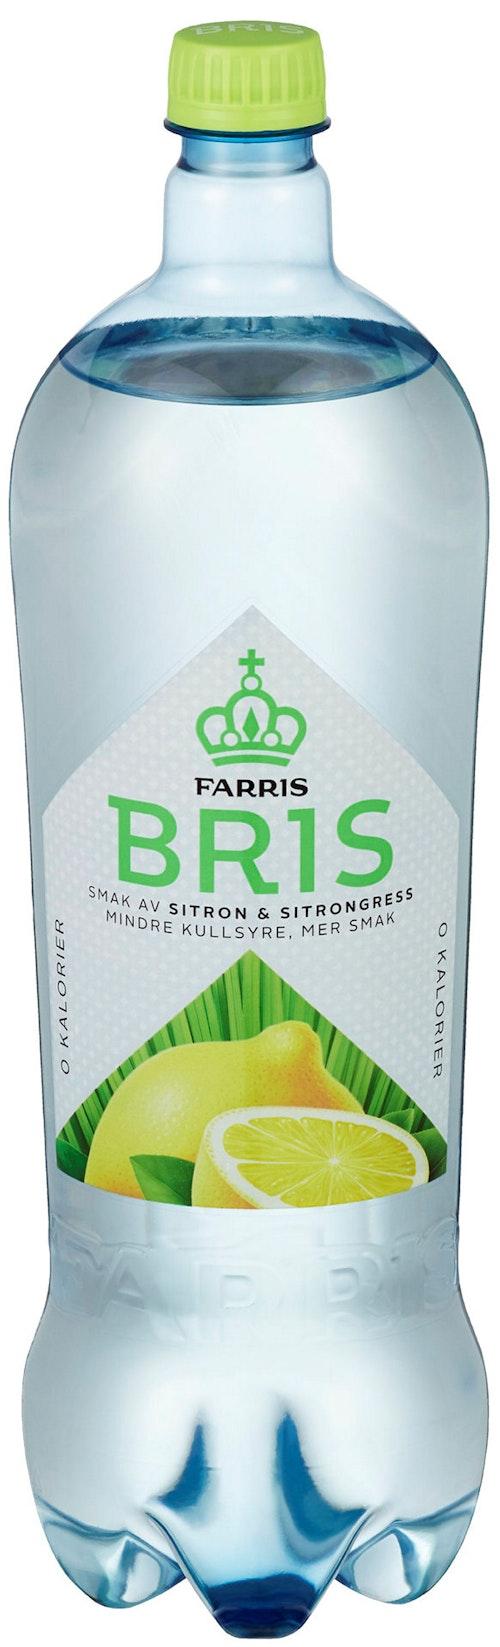 Ringnes Farris Bris Sitron & Sitrongress 1,5 l